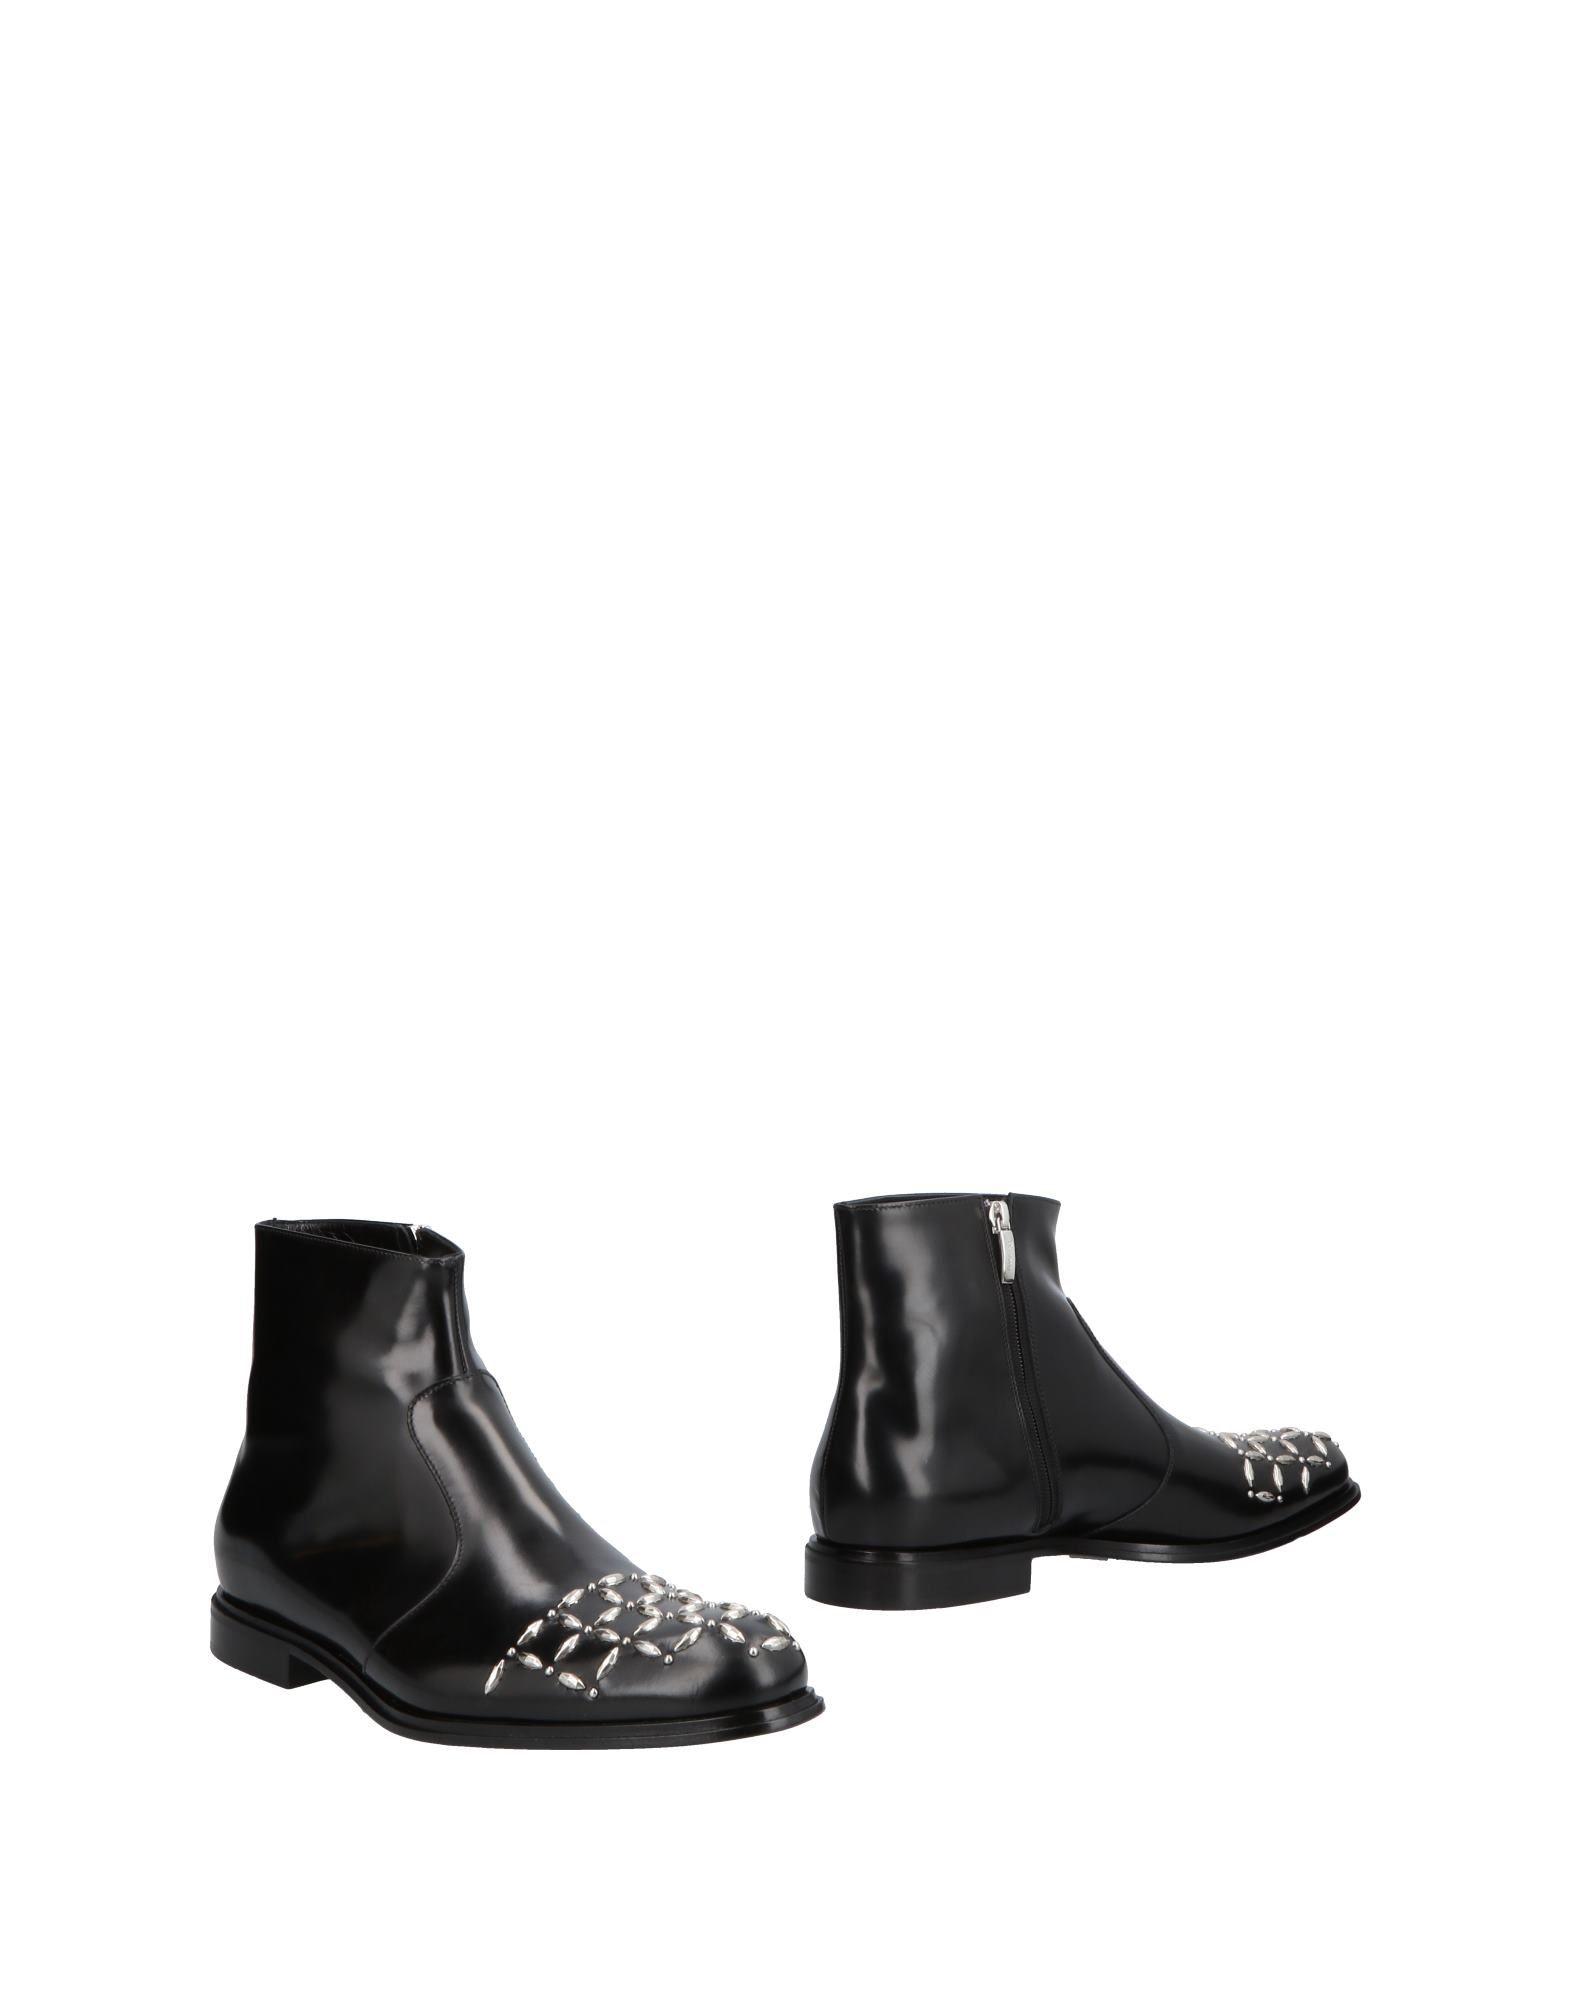 Cesare Paciotti Boots Boots Boots - Men Cesare Paciotti Boots online on  Canada - 11505023GK 19b770